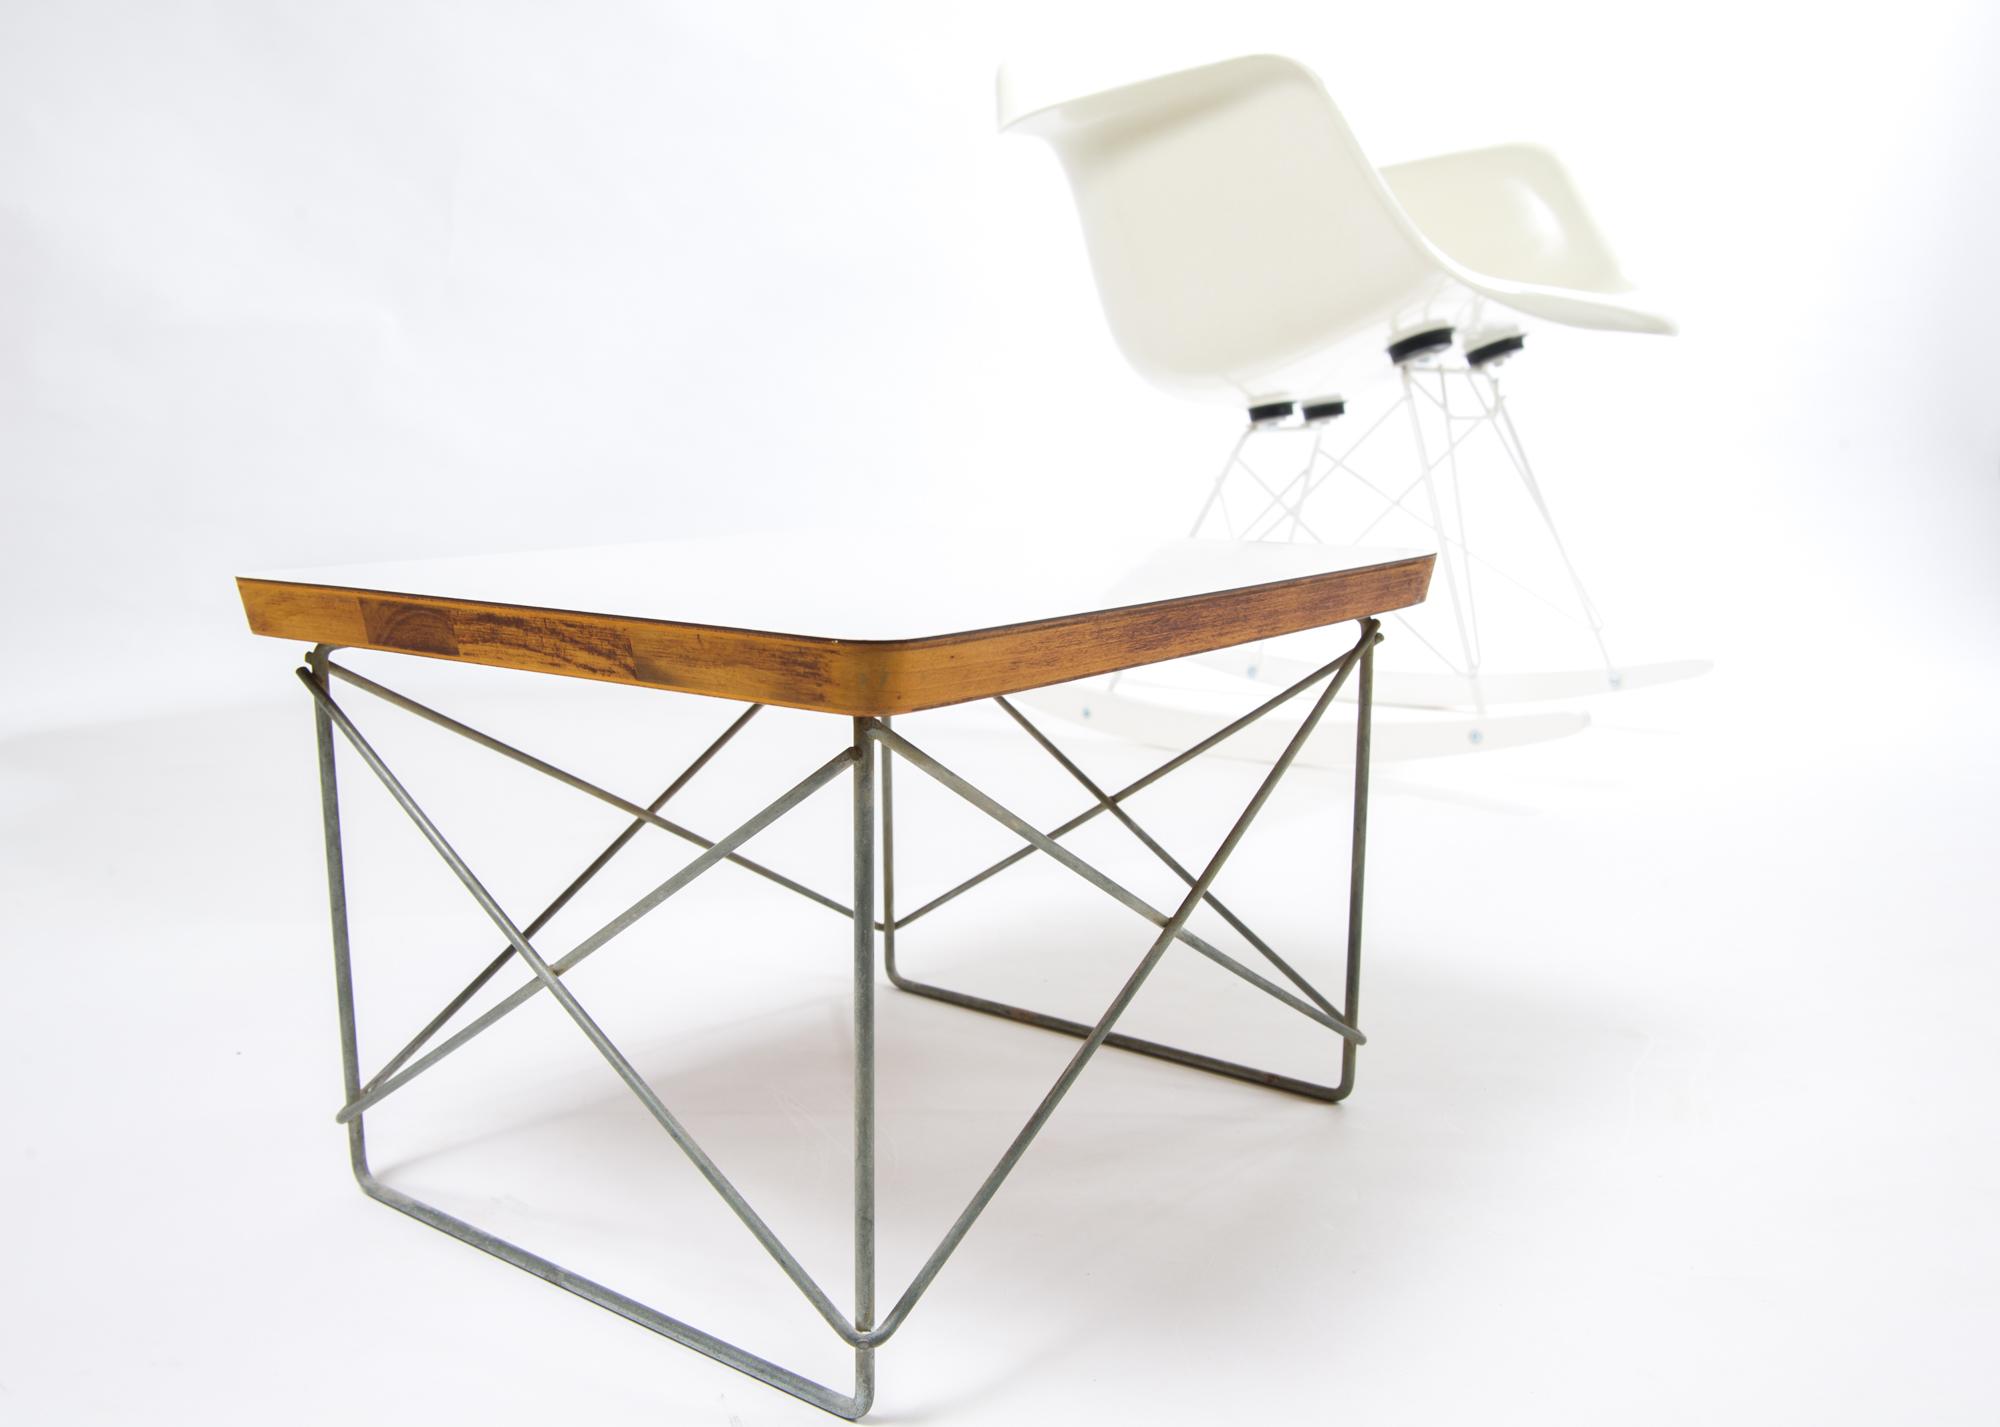 1950s Herman Miller Eames LTR Side Table